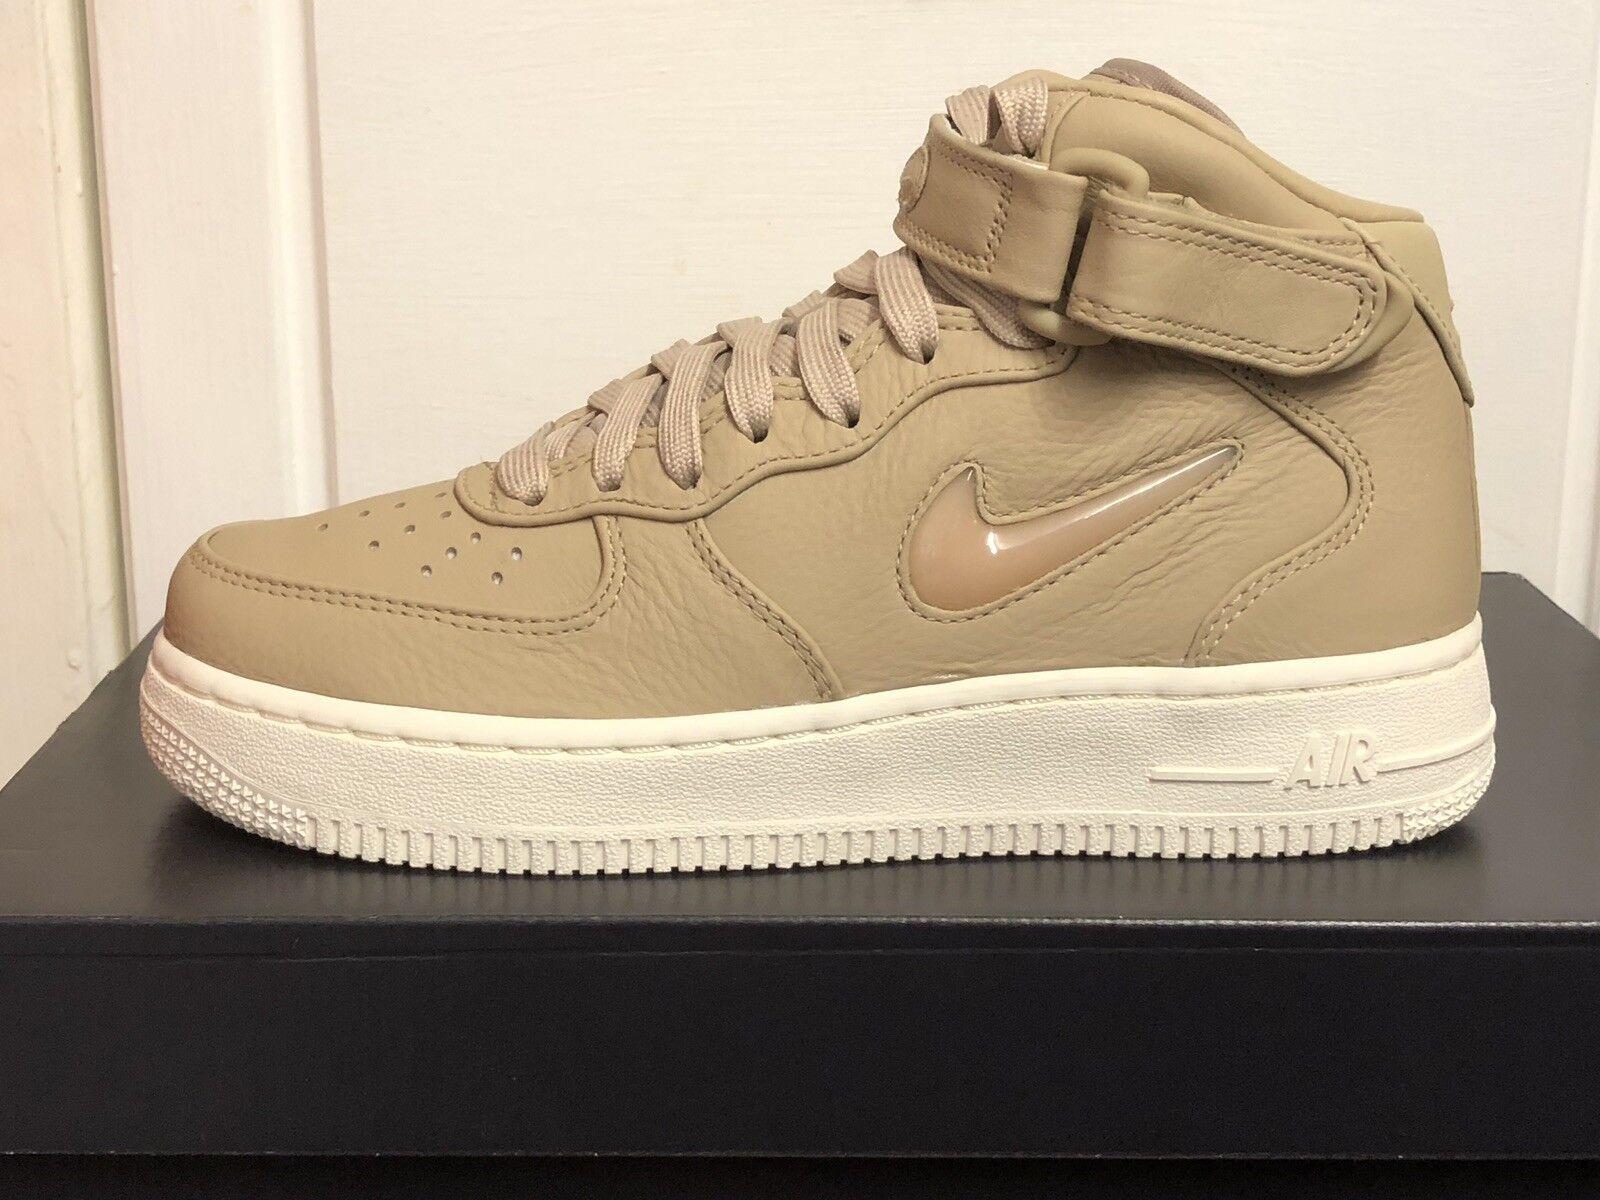 Nike Air Force 1 Mid Retro PRM Bijou Homme Baskets Chaussures UK 4 EUR 36,5 US 4,5